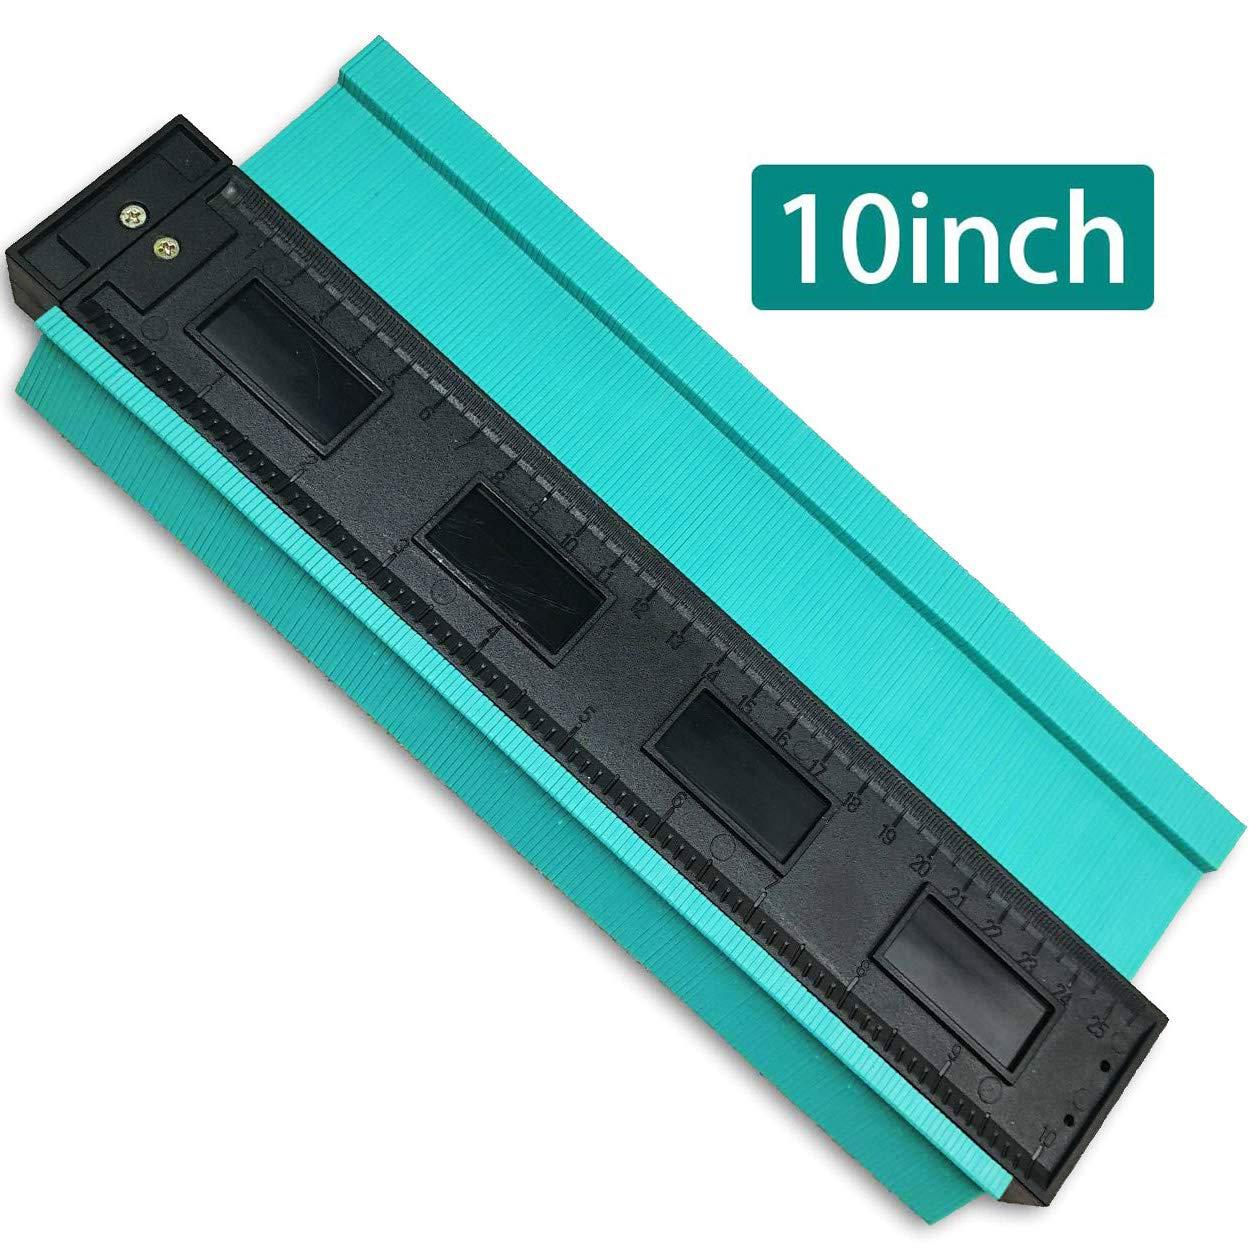 Model# 41018 ALC Siphon Abrasive Blaster Capacity 90-Lb